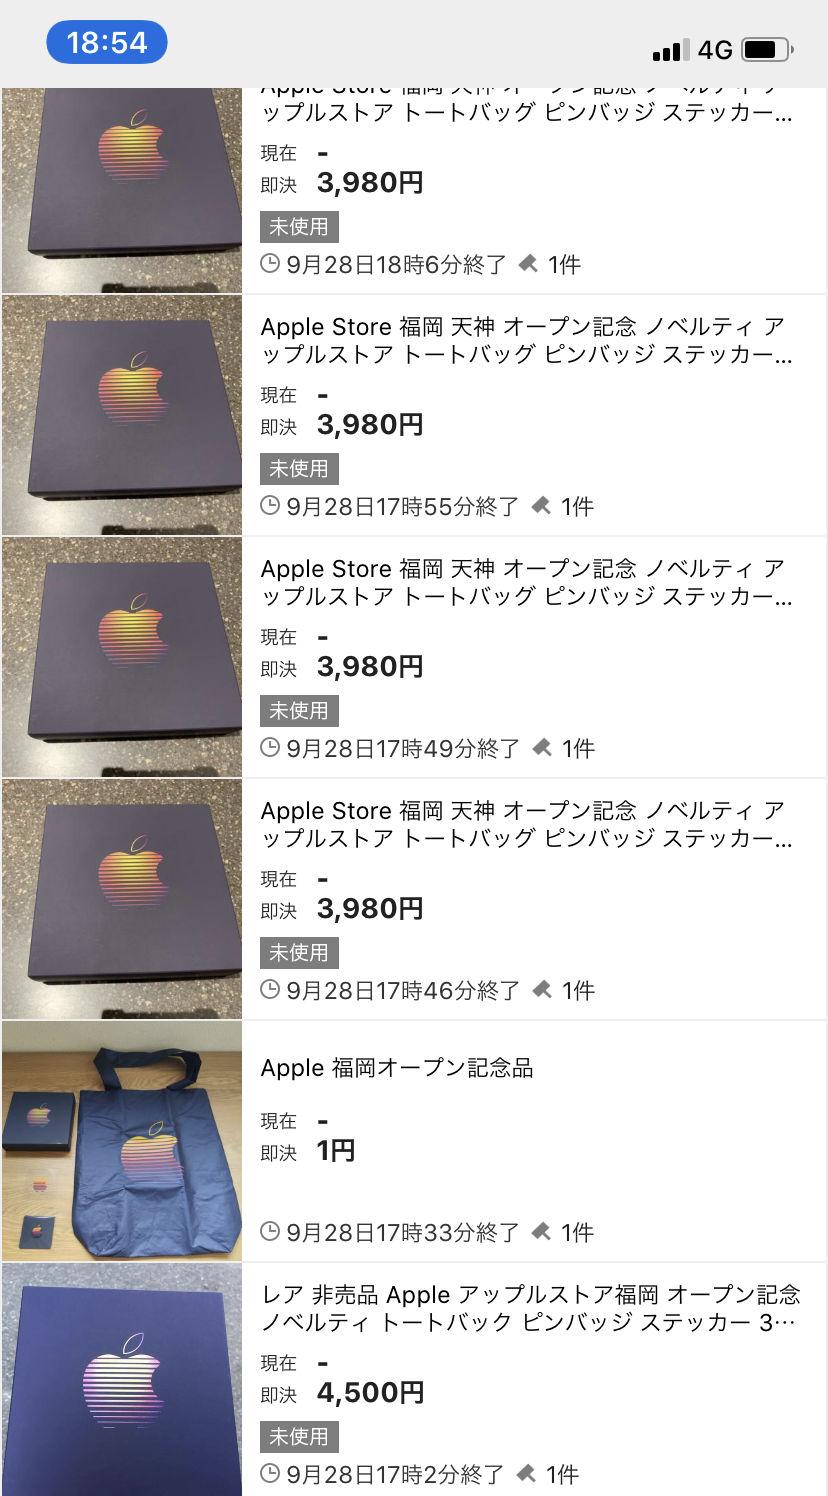 AppleStoreFukuoka tenbai 03